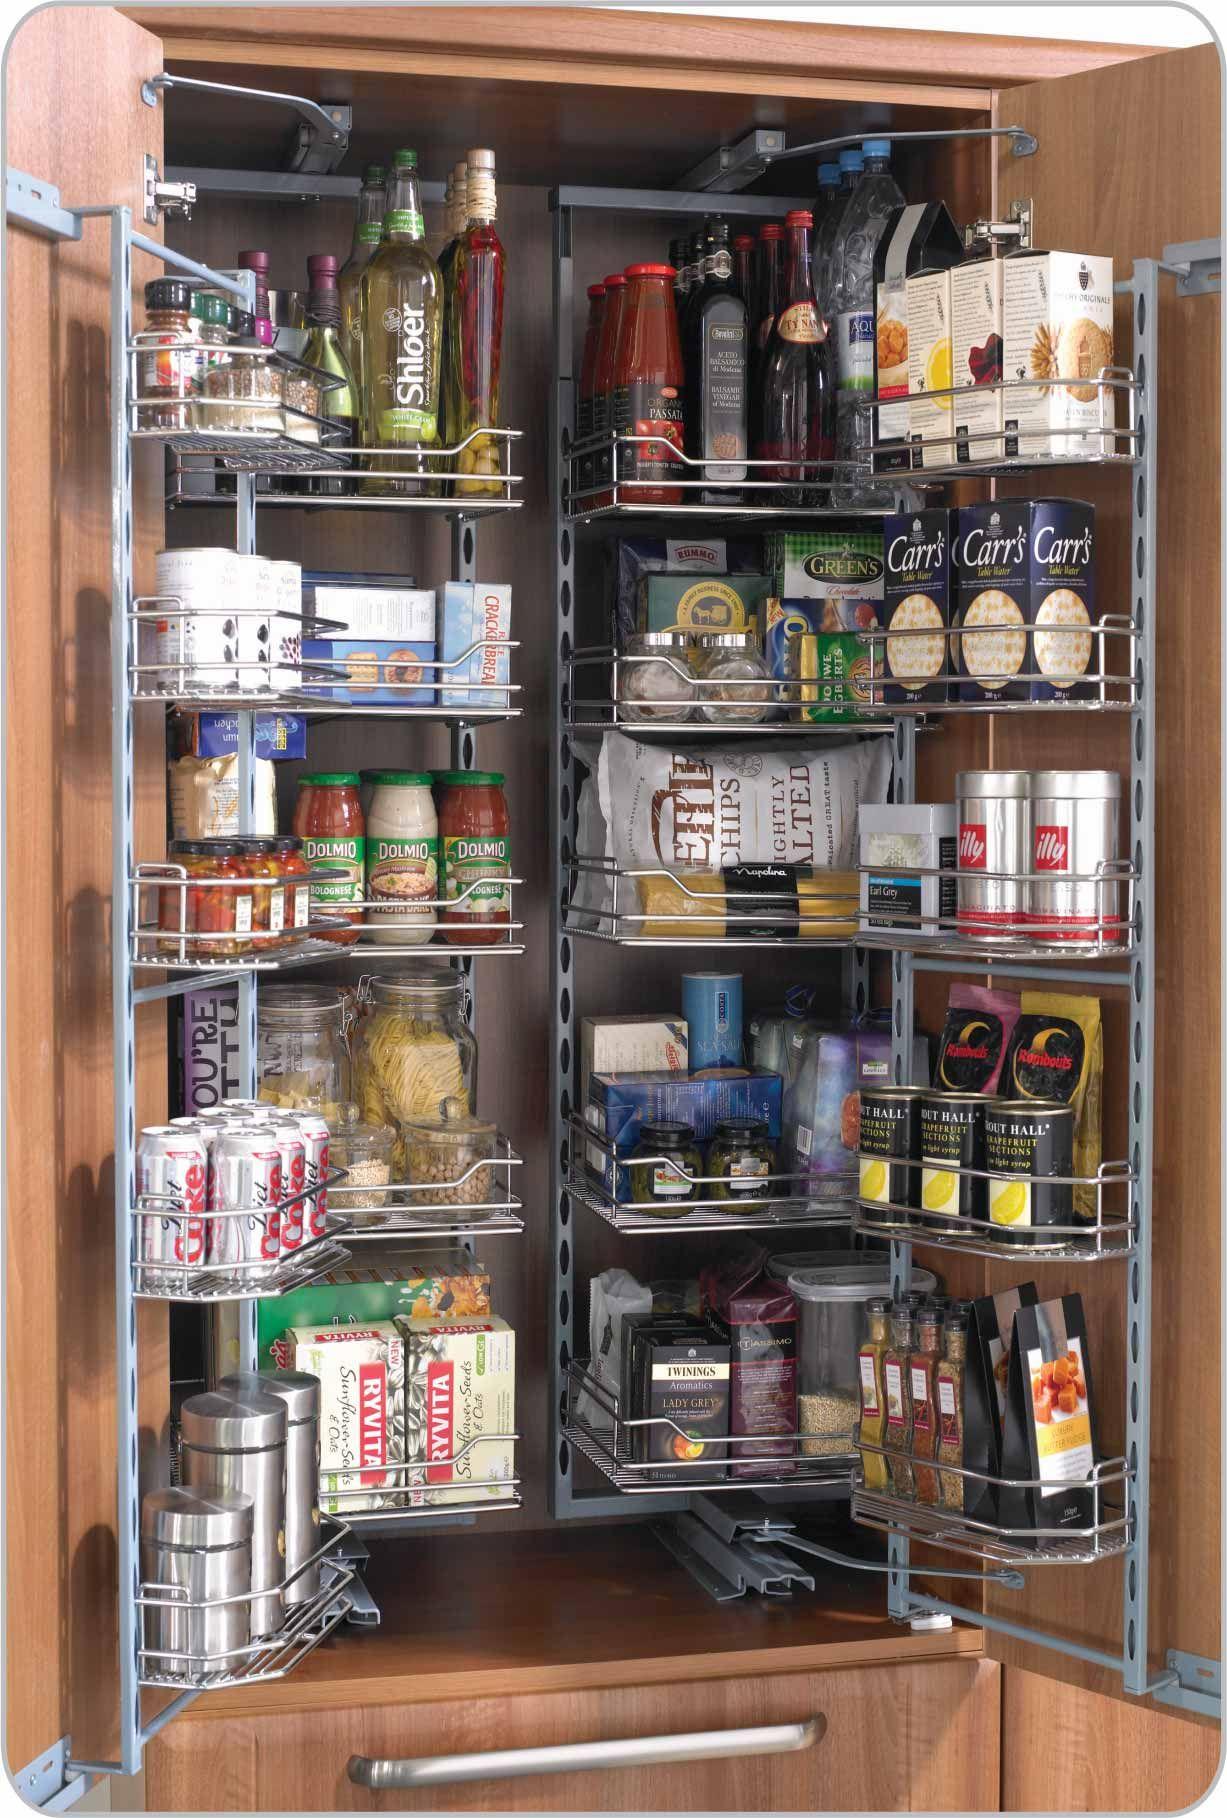 Herrajes sorano para cocinas y closet despensas torre for Organizadores para closet